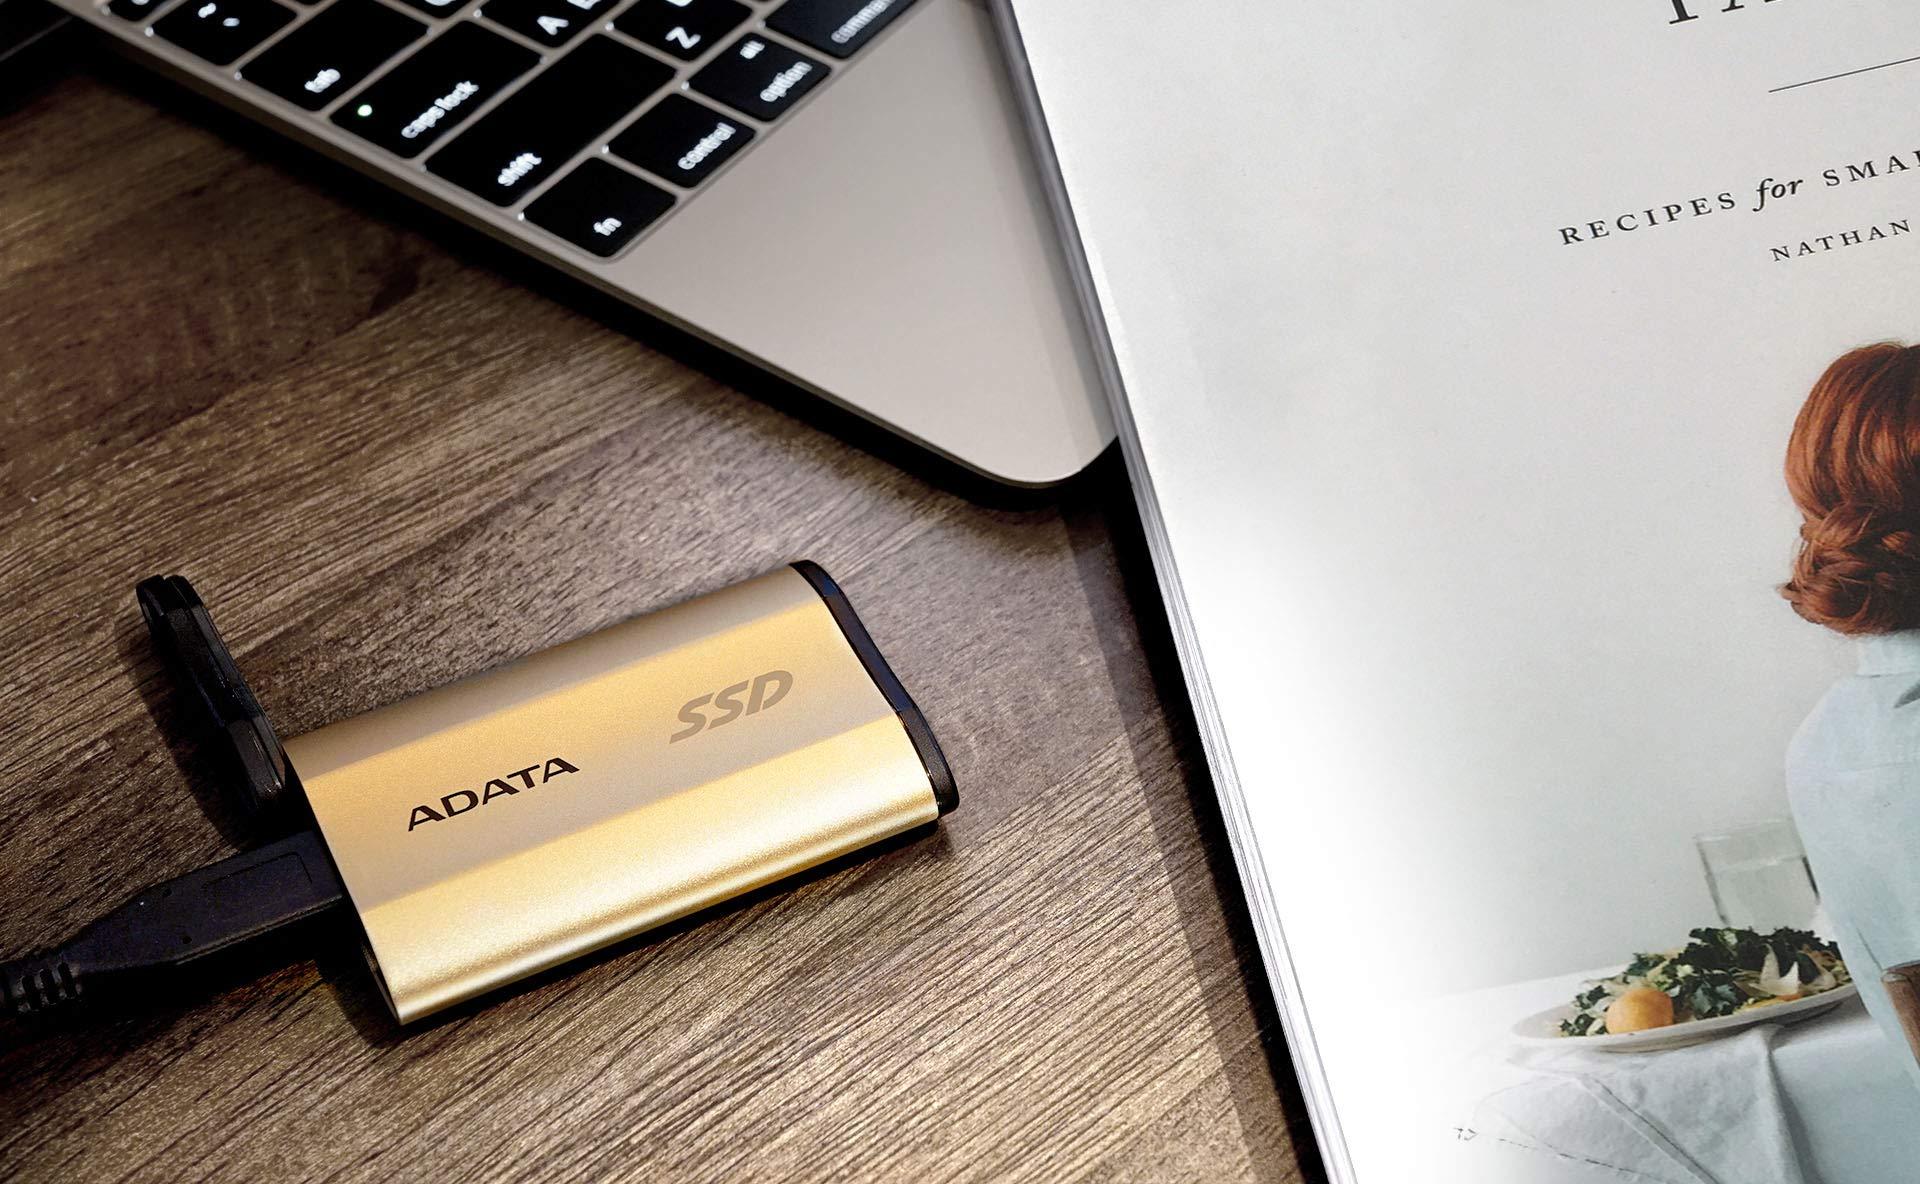 ADATA SE730H 512GB USB 3.1 Gen 2 Type-C Waterproof Shockproof Portable External Solid State Drive GOLD (ASE730H-512GU31-CGD)